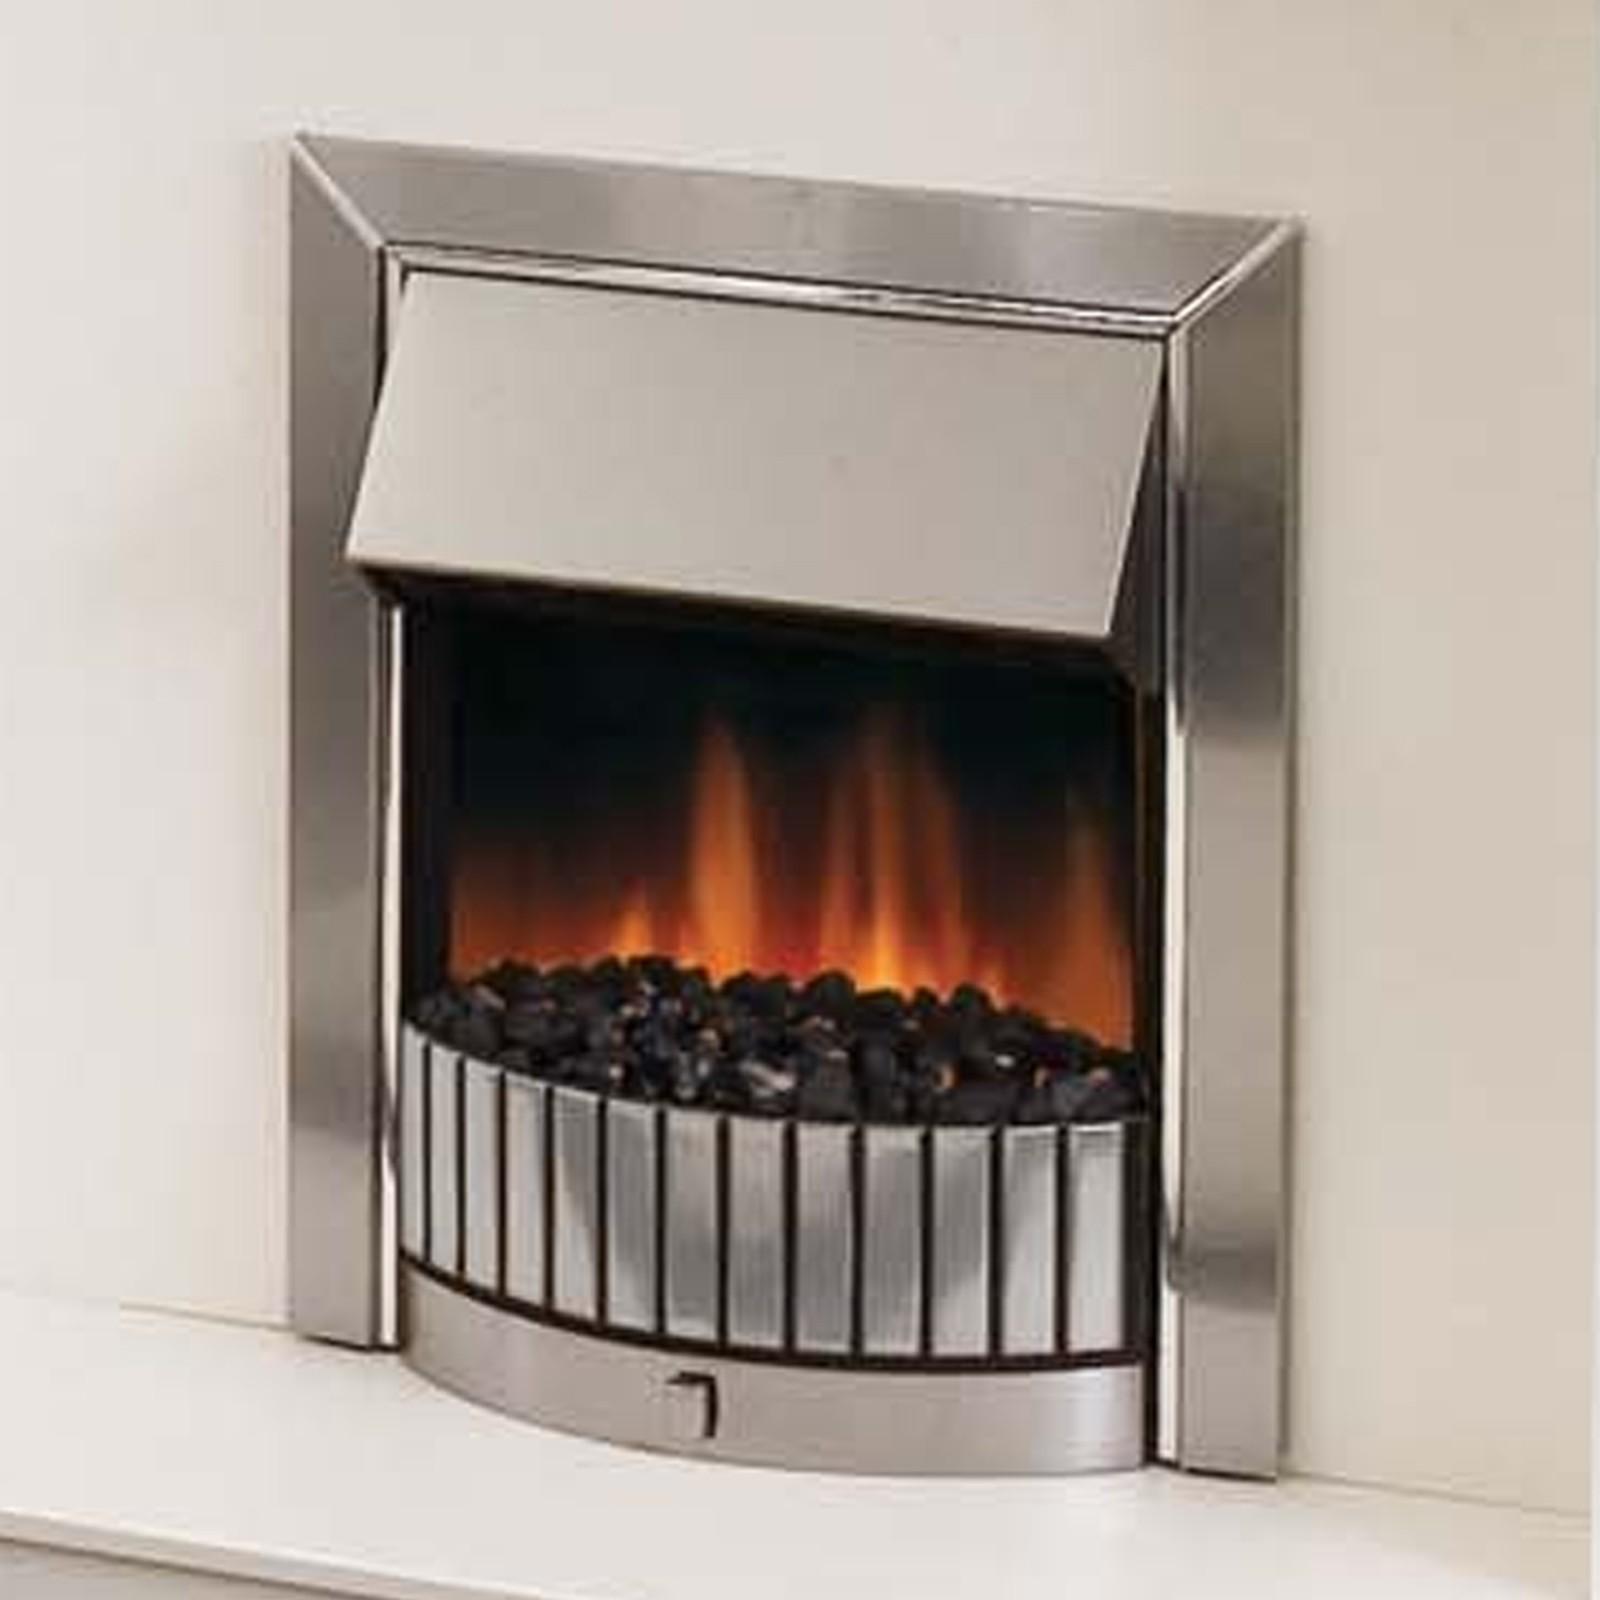 Bargin Beautiful Dimplex Delius Stainless Steel Optiflame Electric Fire